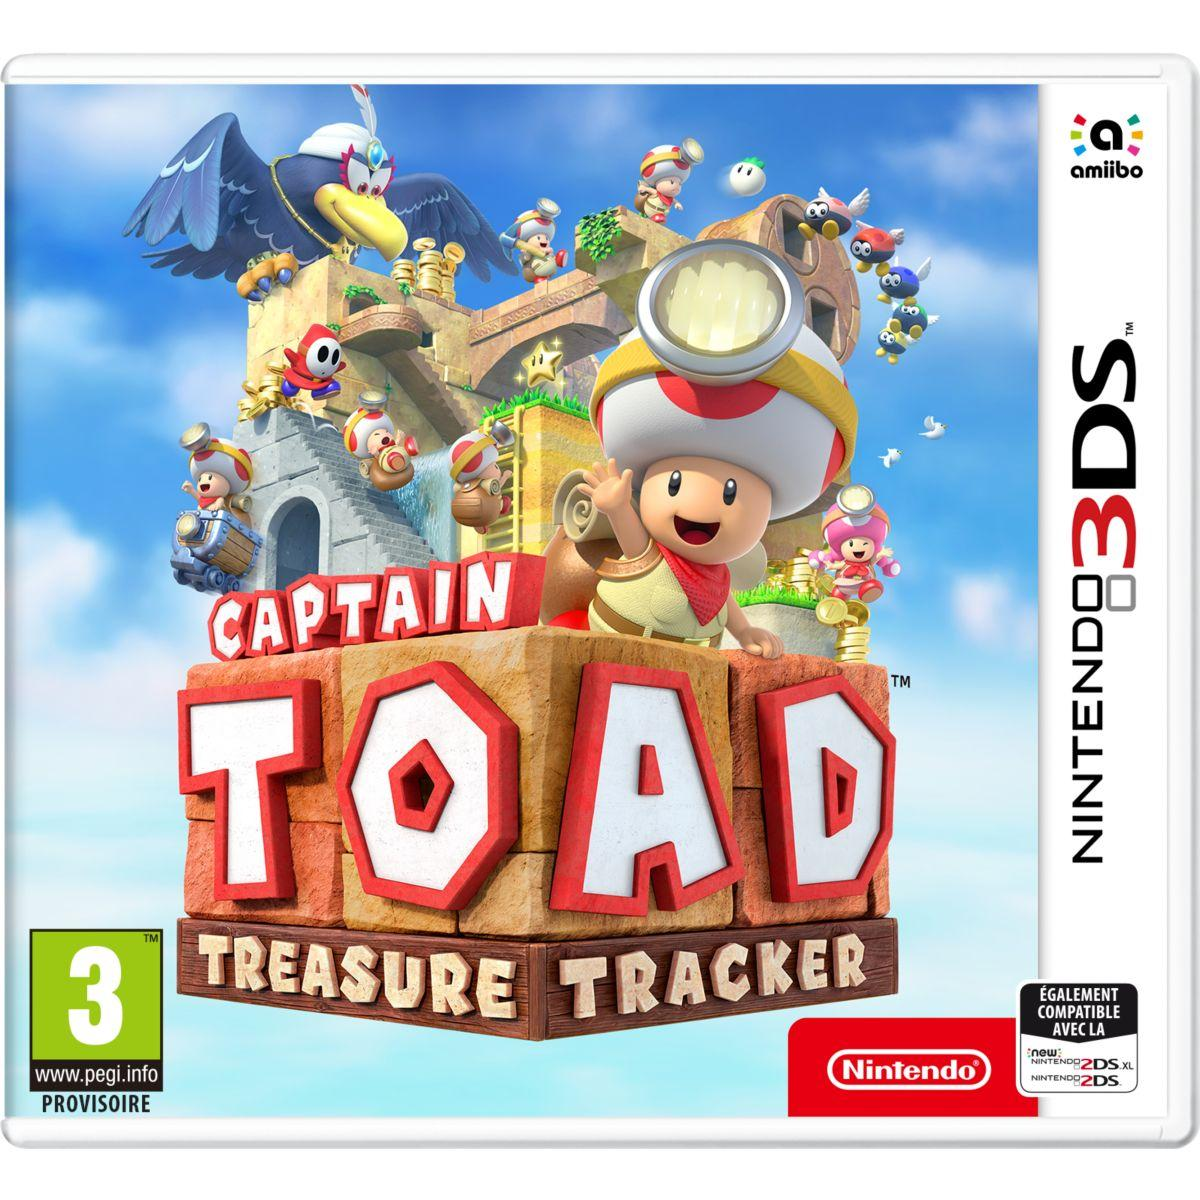 Jeu 3ds nintendo captain toad treasure tracker (photo)